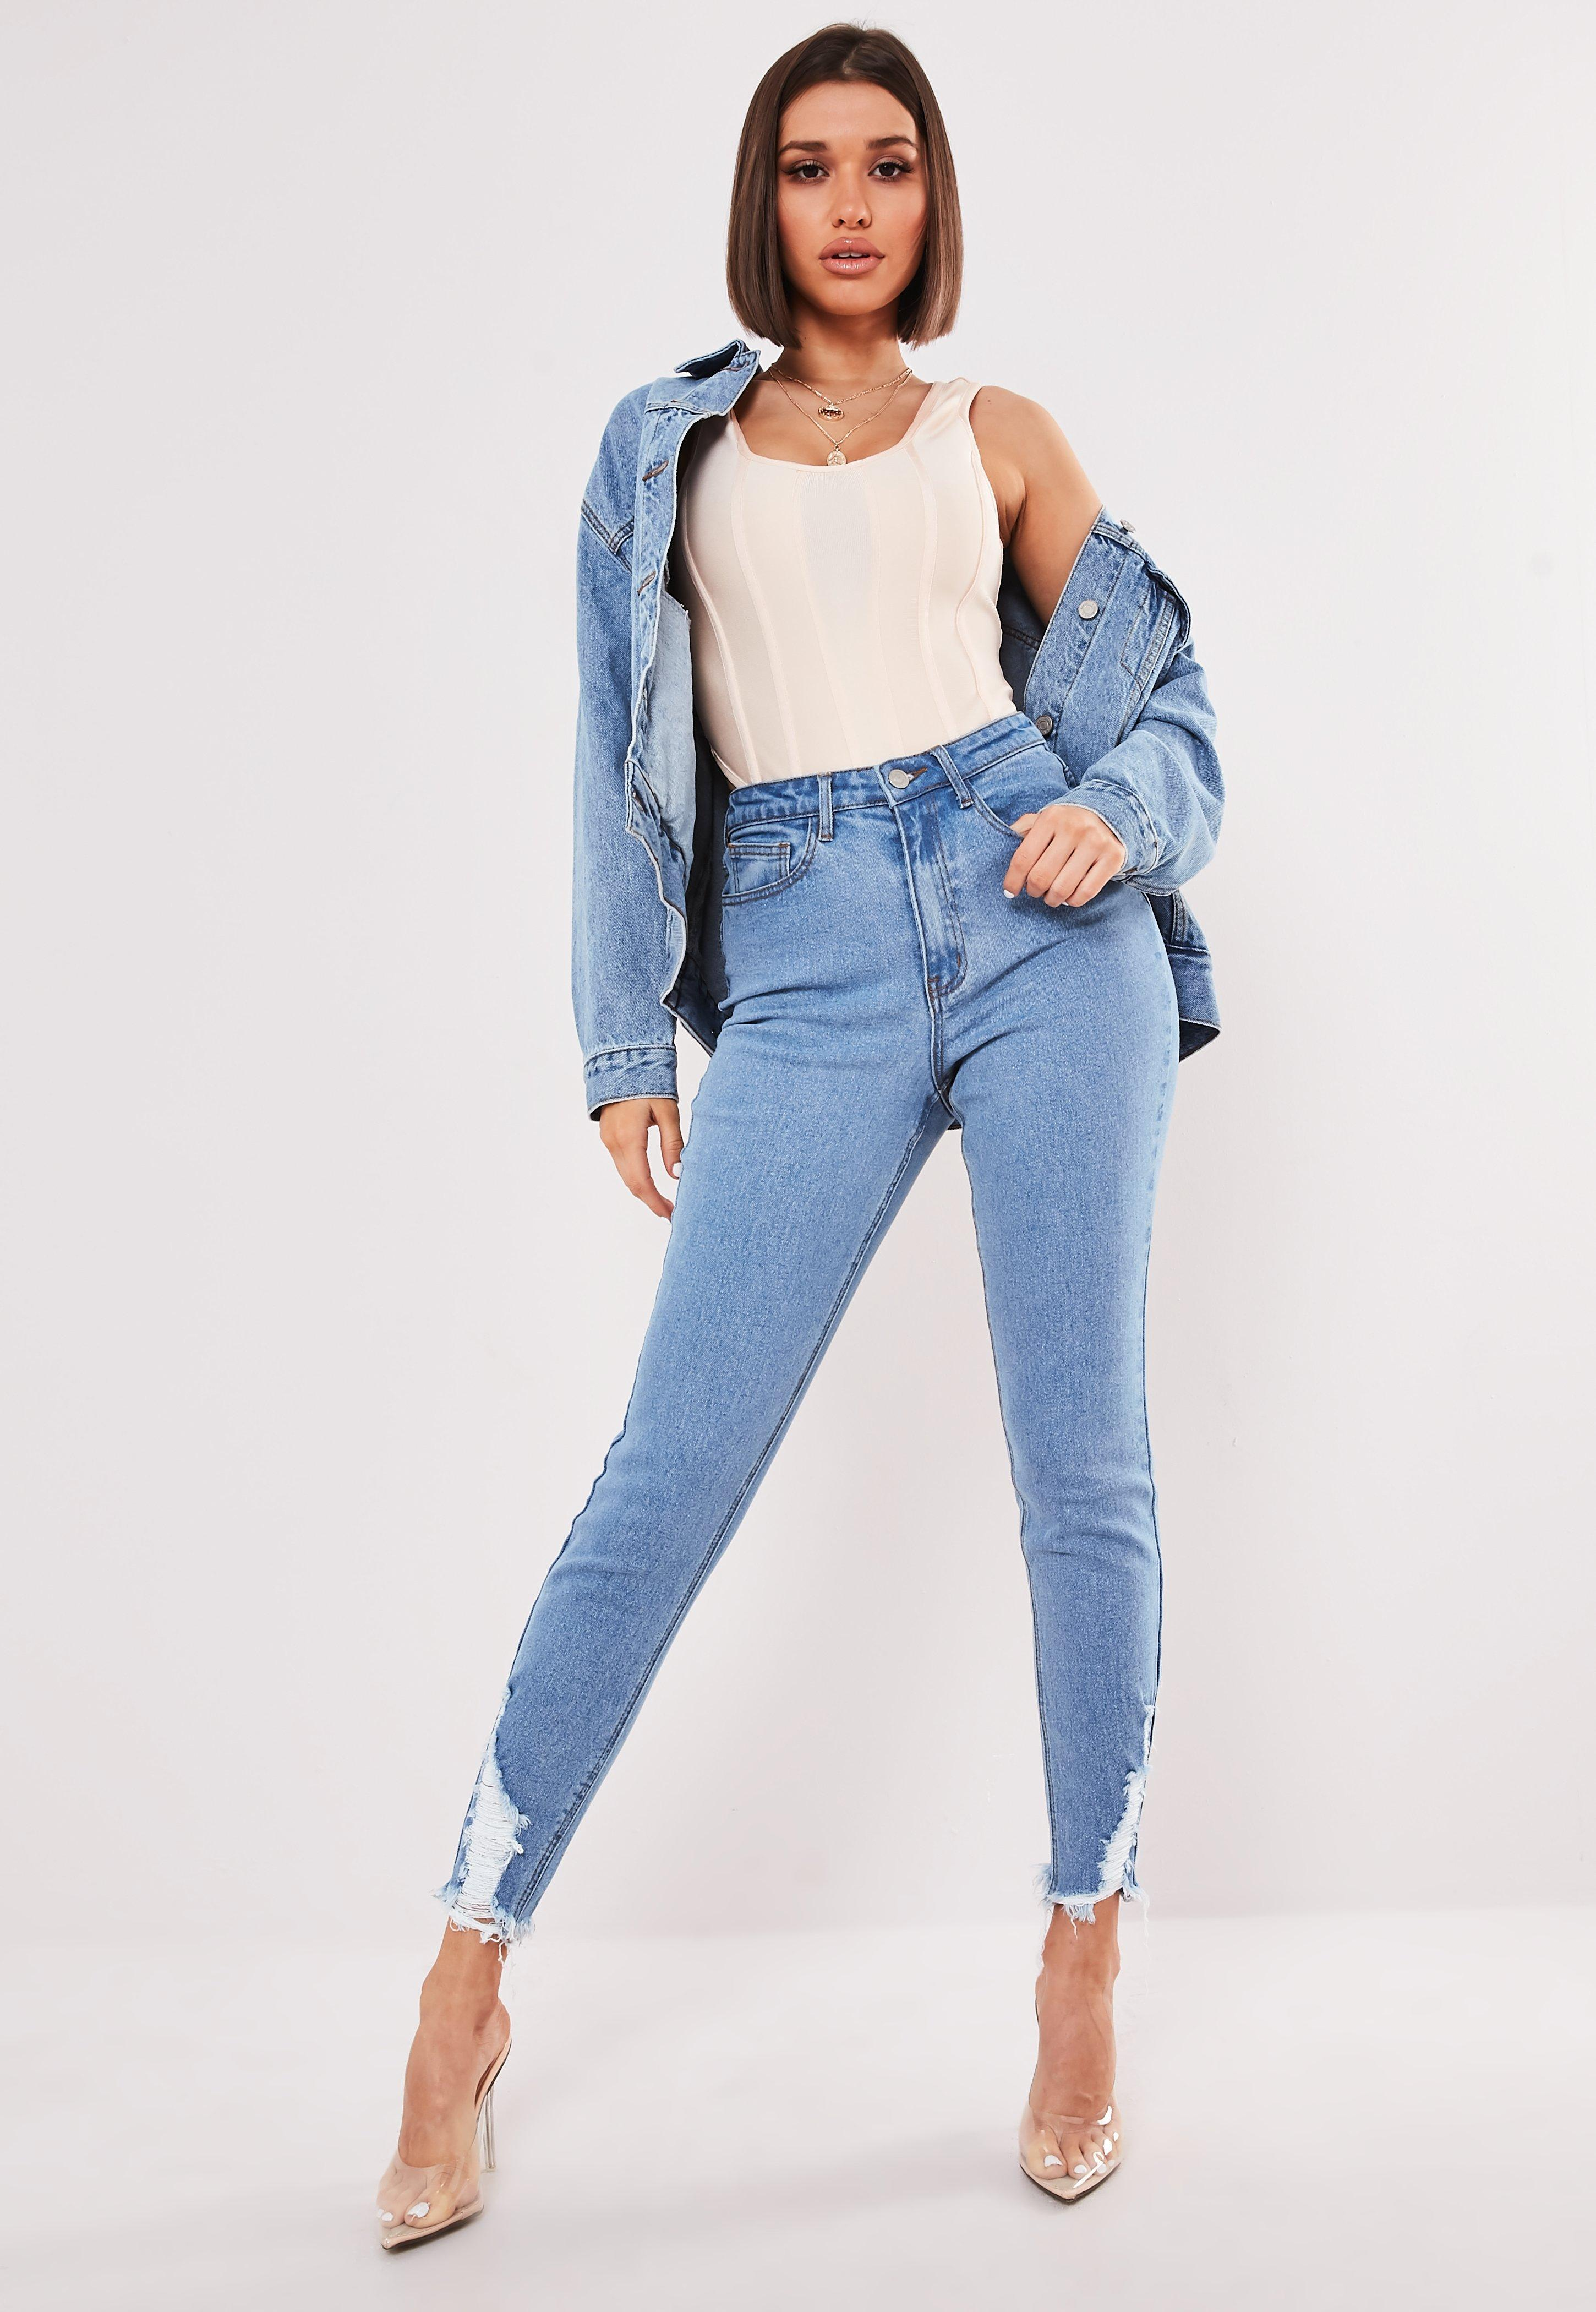 2e5d6443f9e9c8 Petite Jeans | Womens Petite Skinny Jeans - Missguided